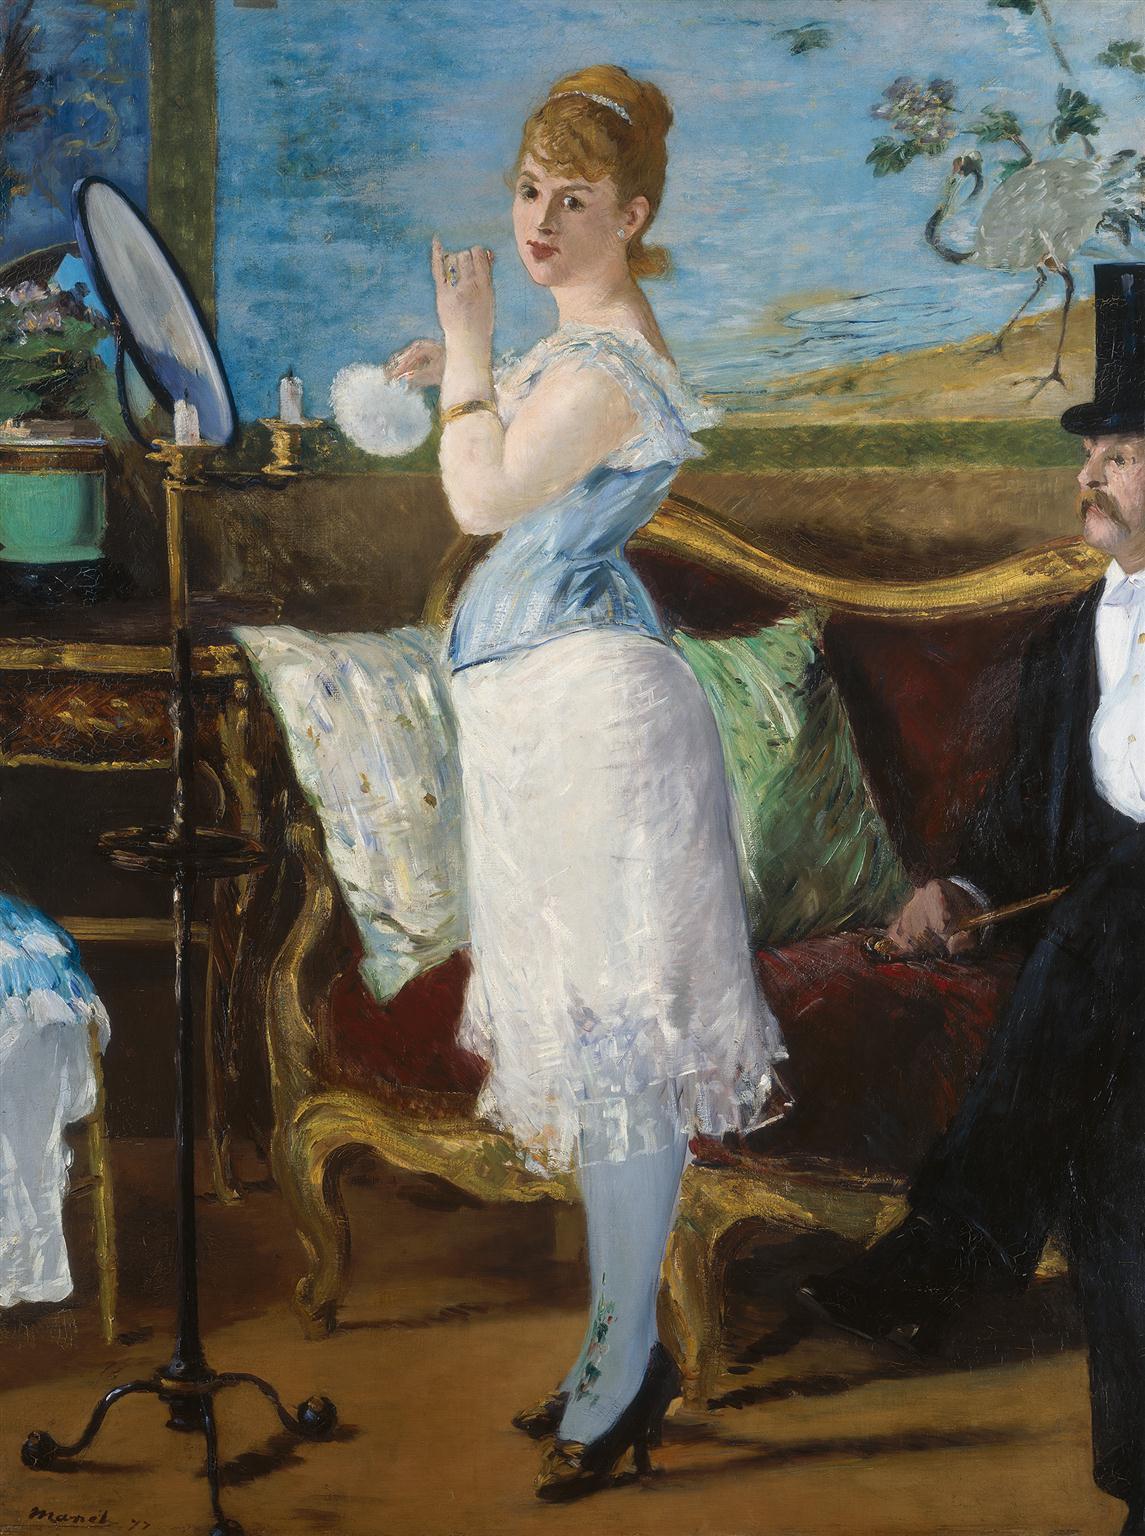 Edouard Manet (1832 - 1883) Nana, 1877 Öl auf Leinwand 154 x 115 cm © Hamburger Kunsthalle / bpk Foto: Elke Walford